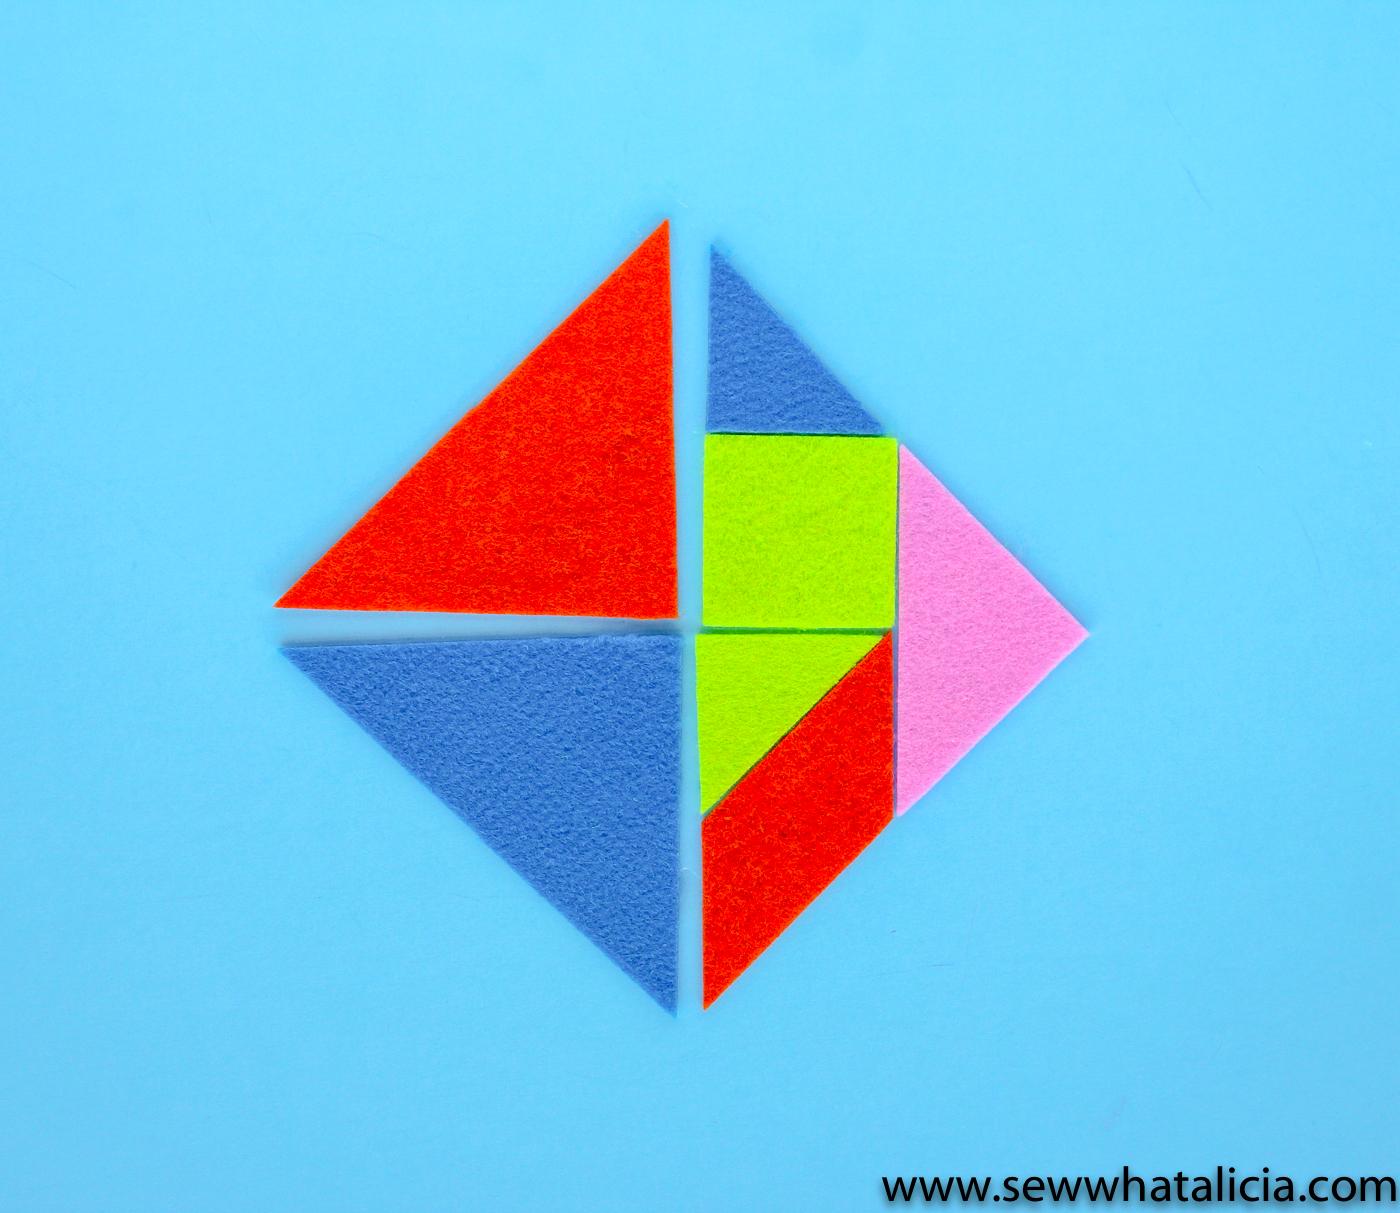 image about Printable Tangrams Pdf Free named Cuttable and Printable Tangrams PDF - Sew What, Alicia?